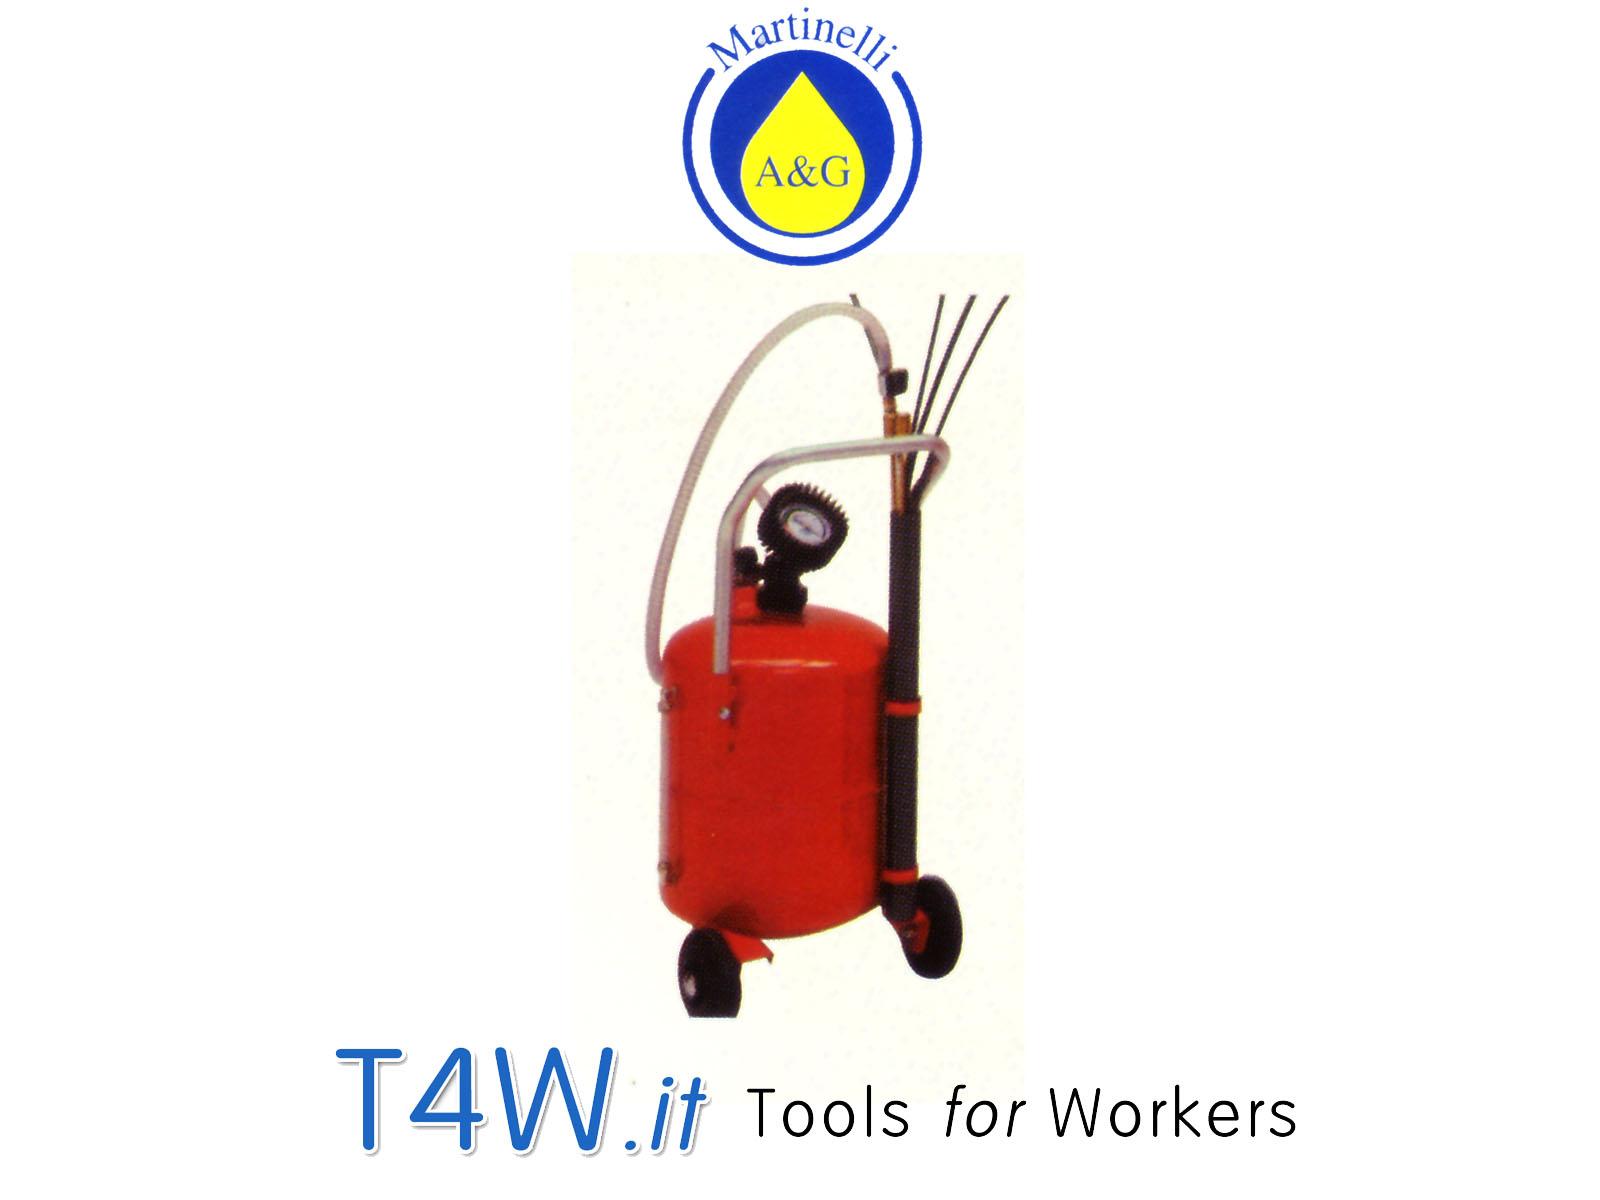 Aspiratore pneumatico per olio lt. 24 Art. 2800 Martinelli -